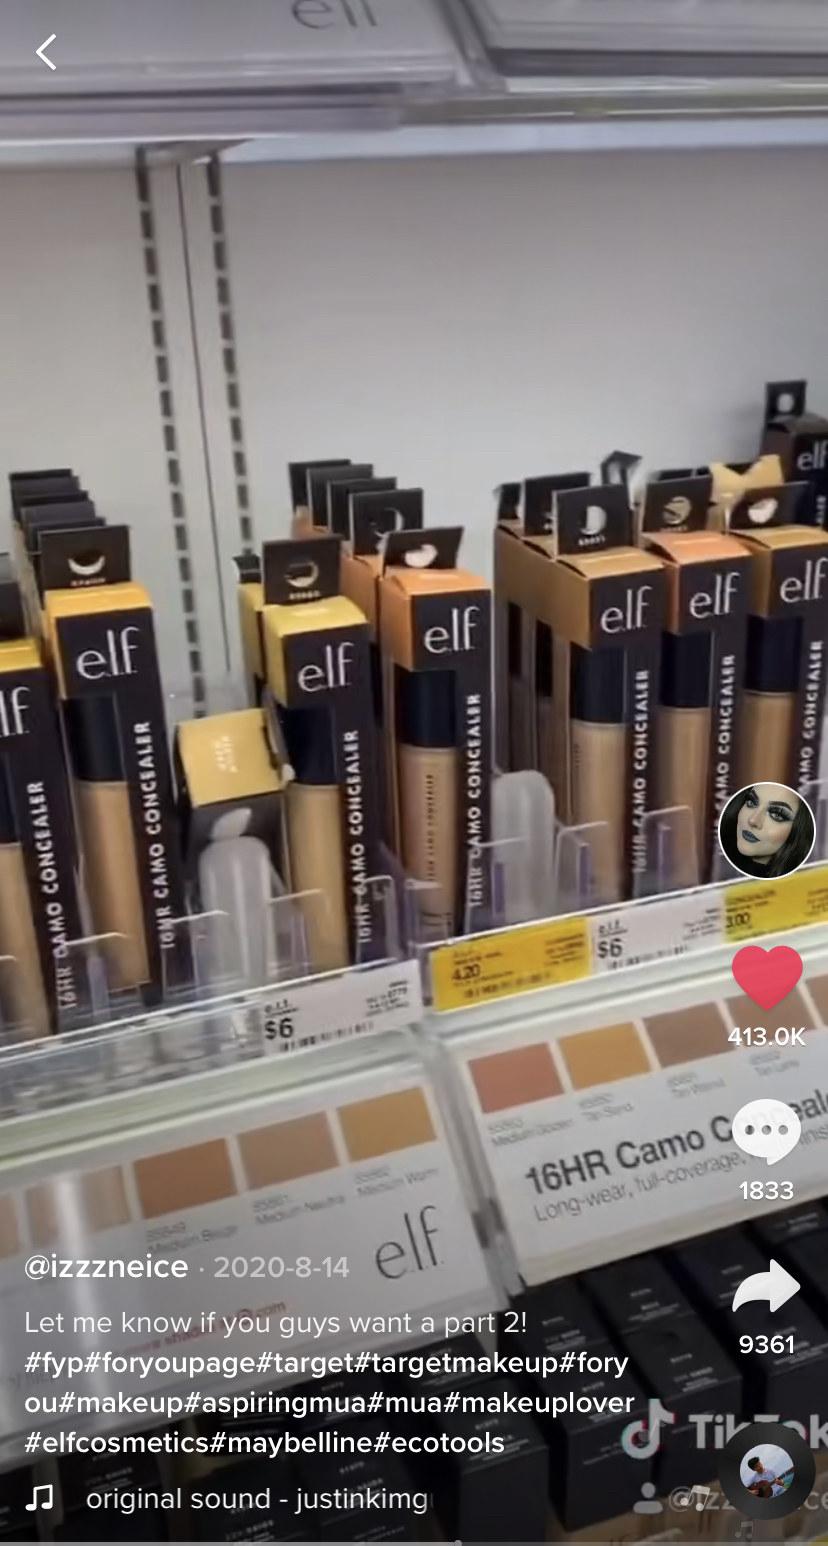 Screen shot of @izzneice's Tik Tok showing the ELF Camo Concealer at Target